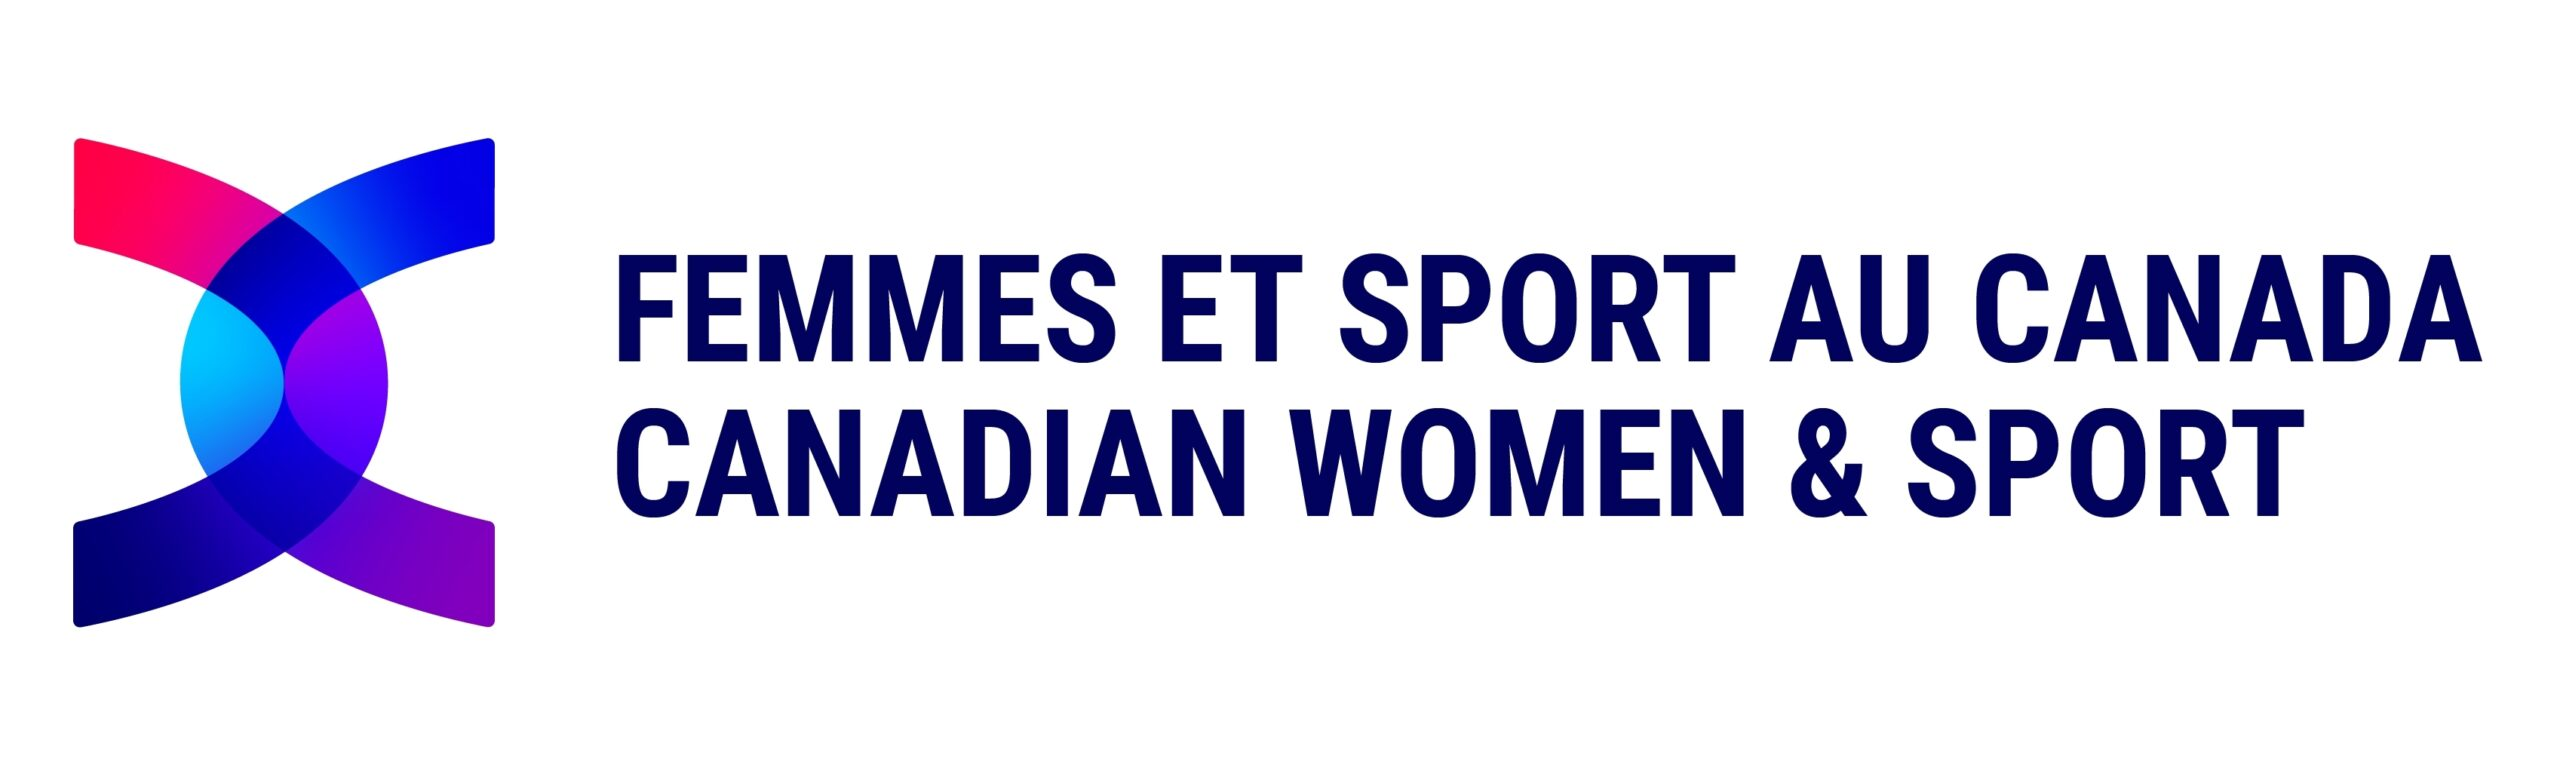 https://womenandsport.ca/